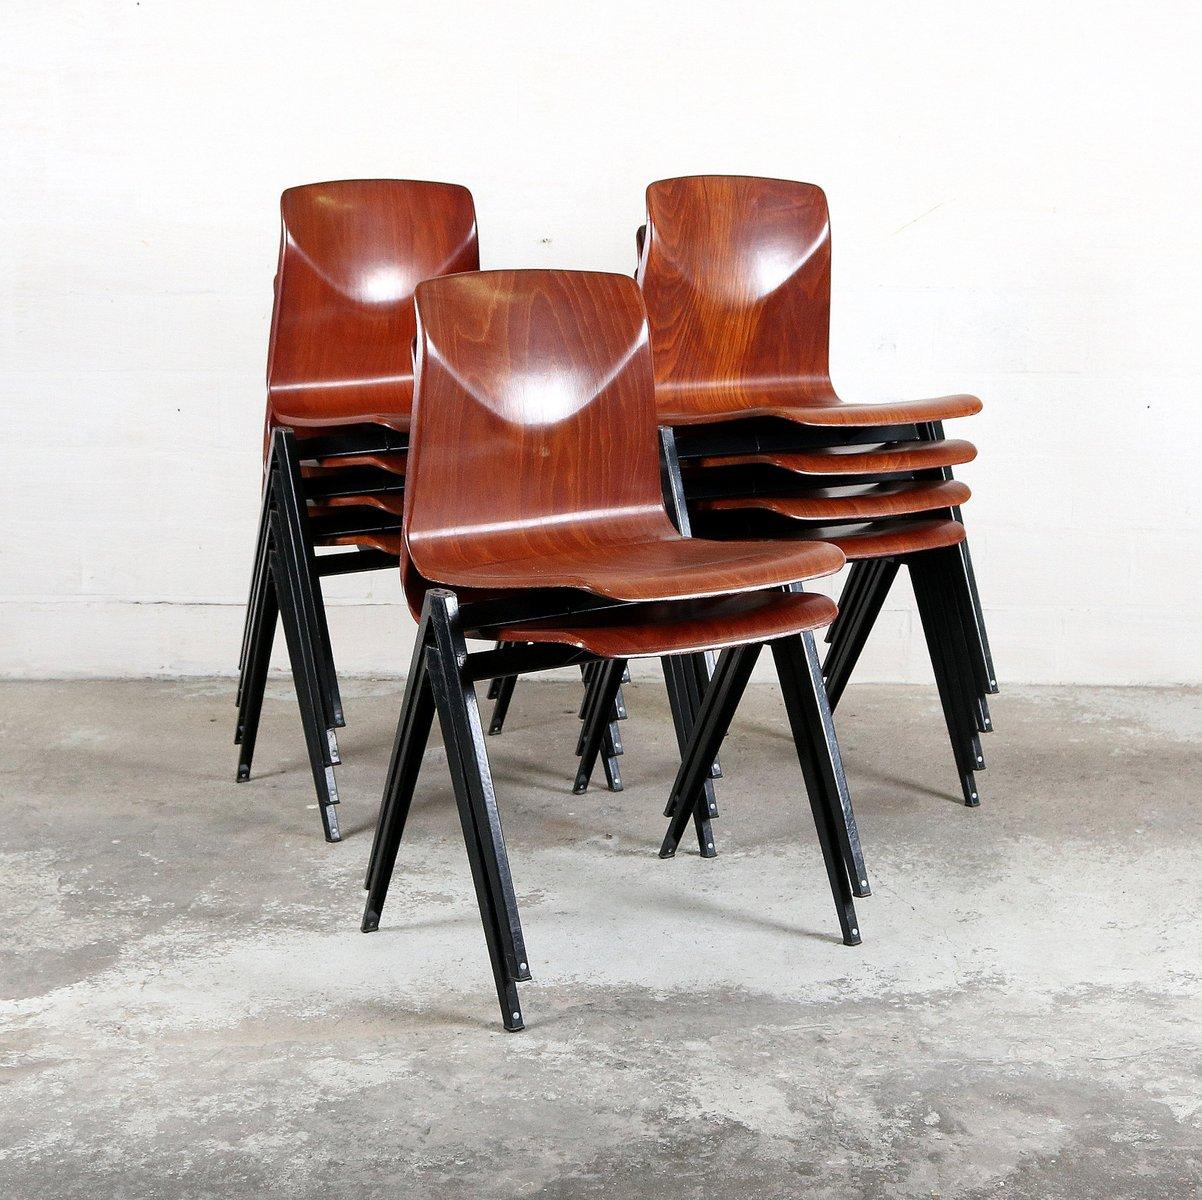 Mid century stuhl aus schichtholz metall von pagholz bei pamono kaufen - Mid century stuhl ...